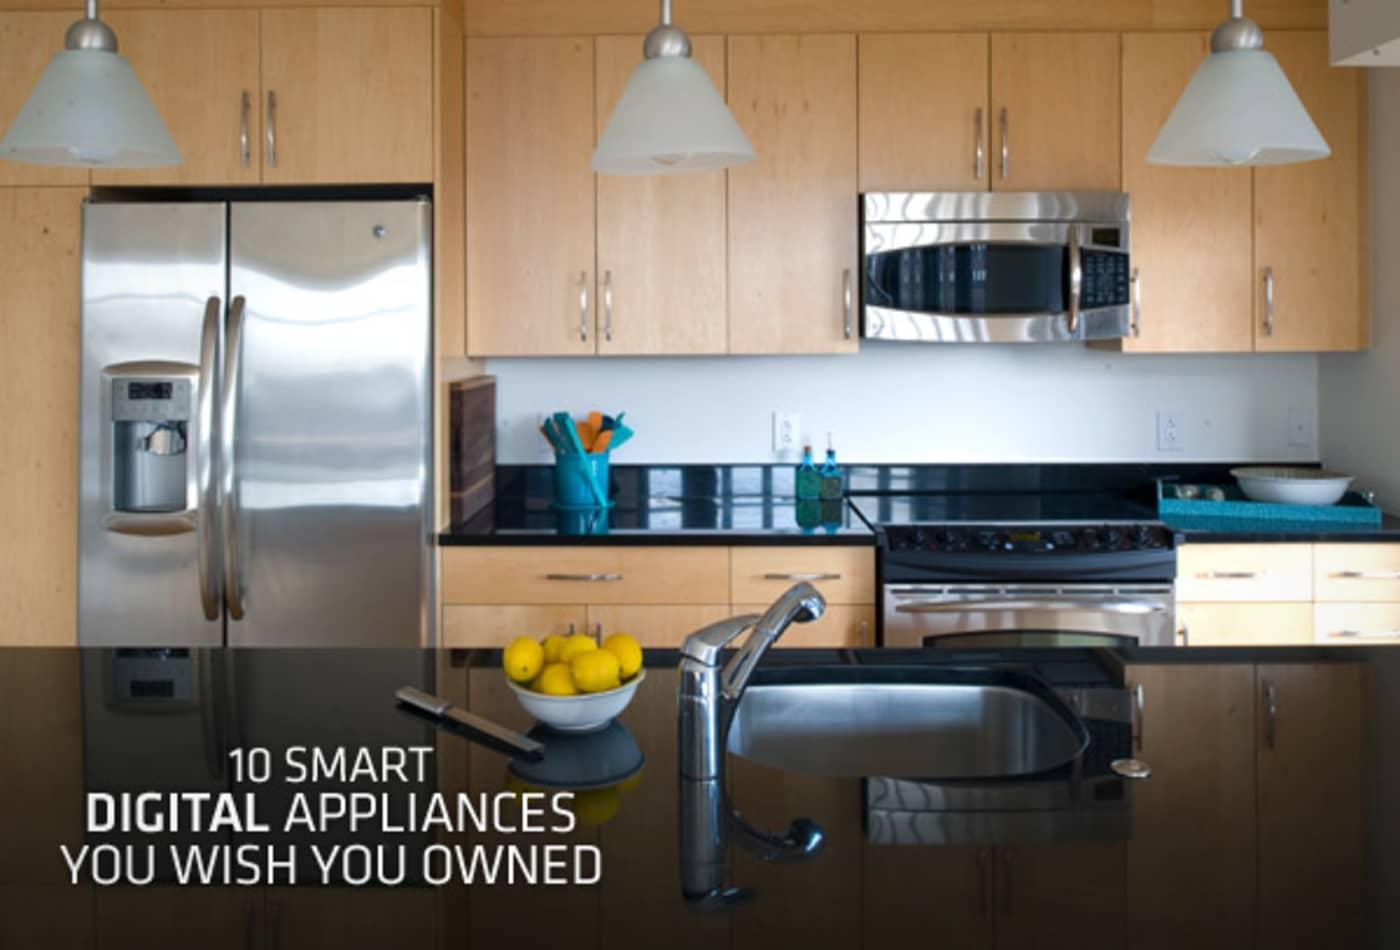 10-Smart-Dig-Appliances-COVER-01.jpg